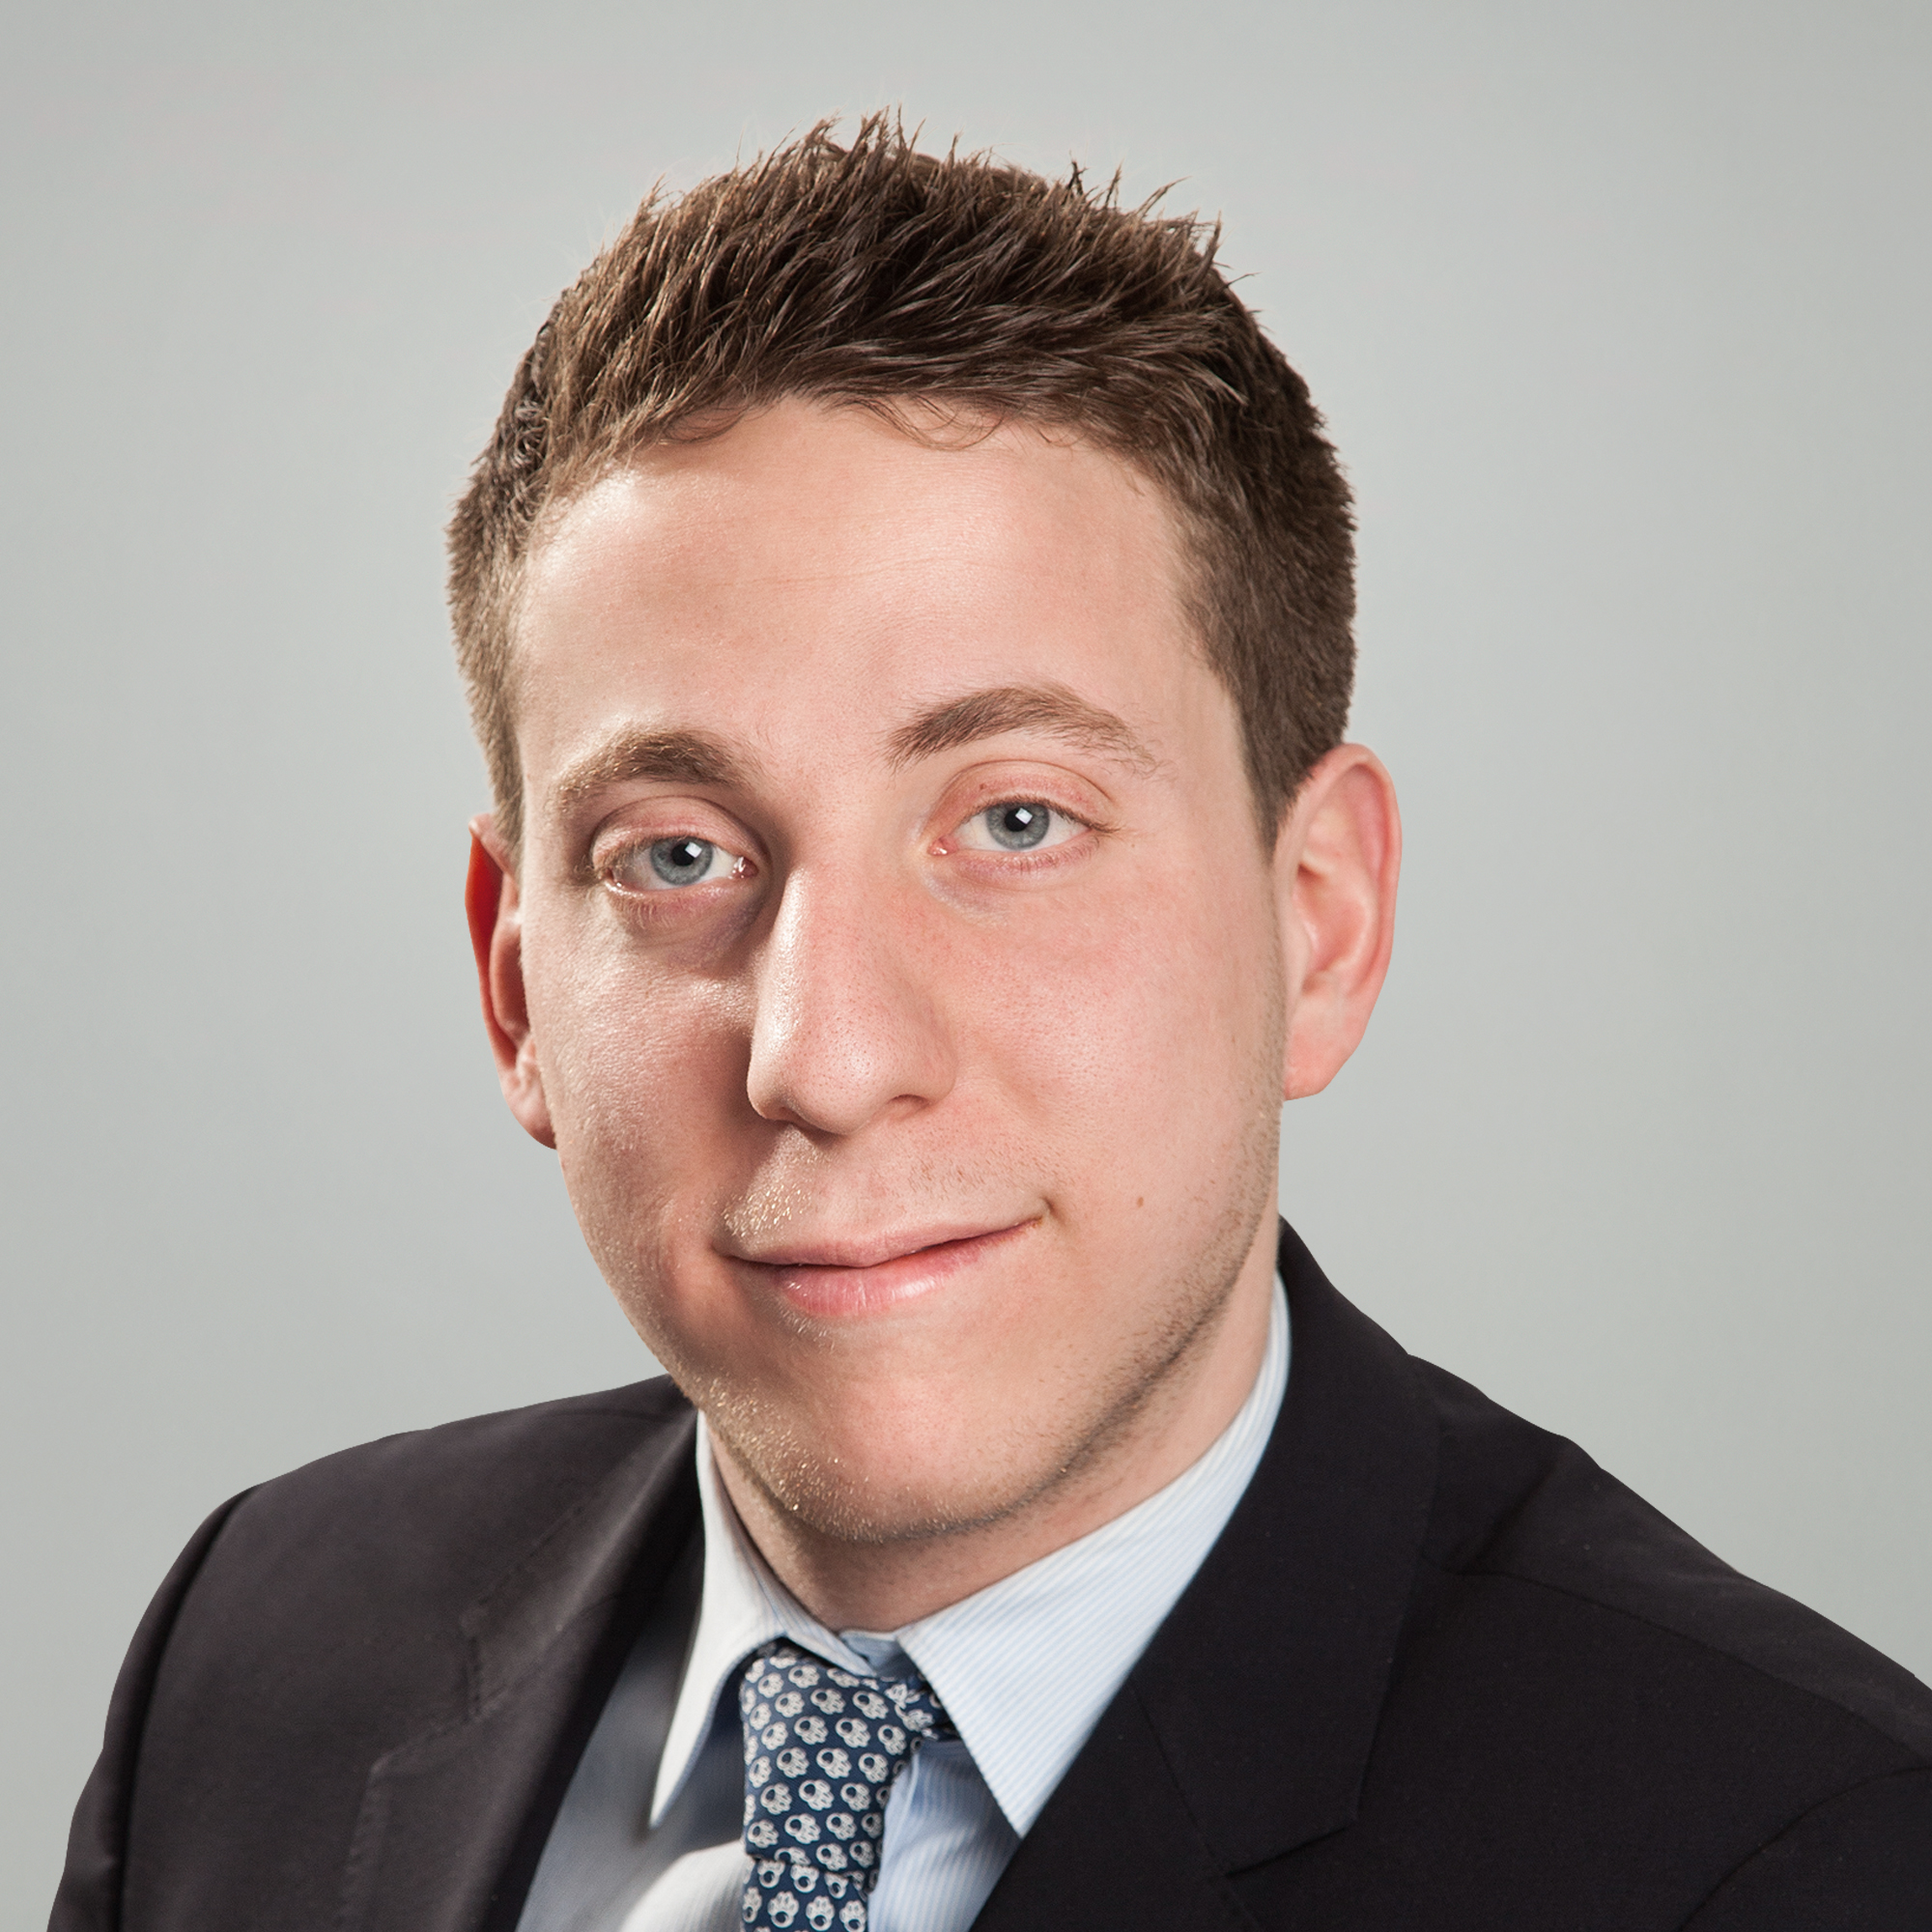 Jesse Deutch, VP at Ariel Property Advisors